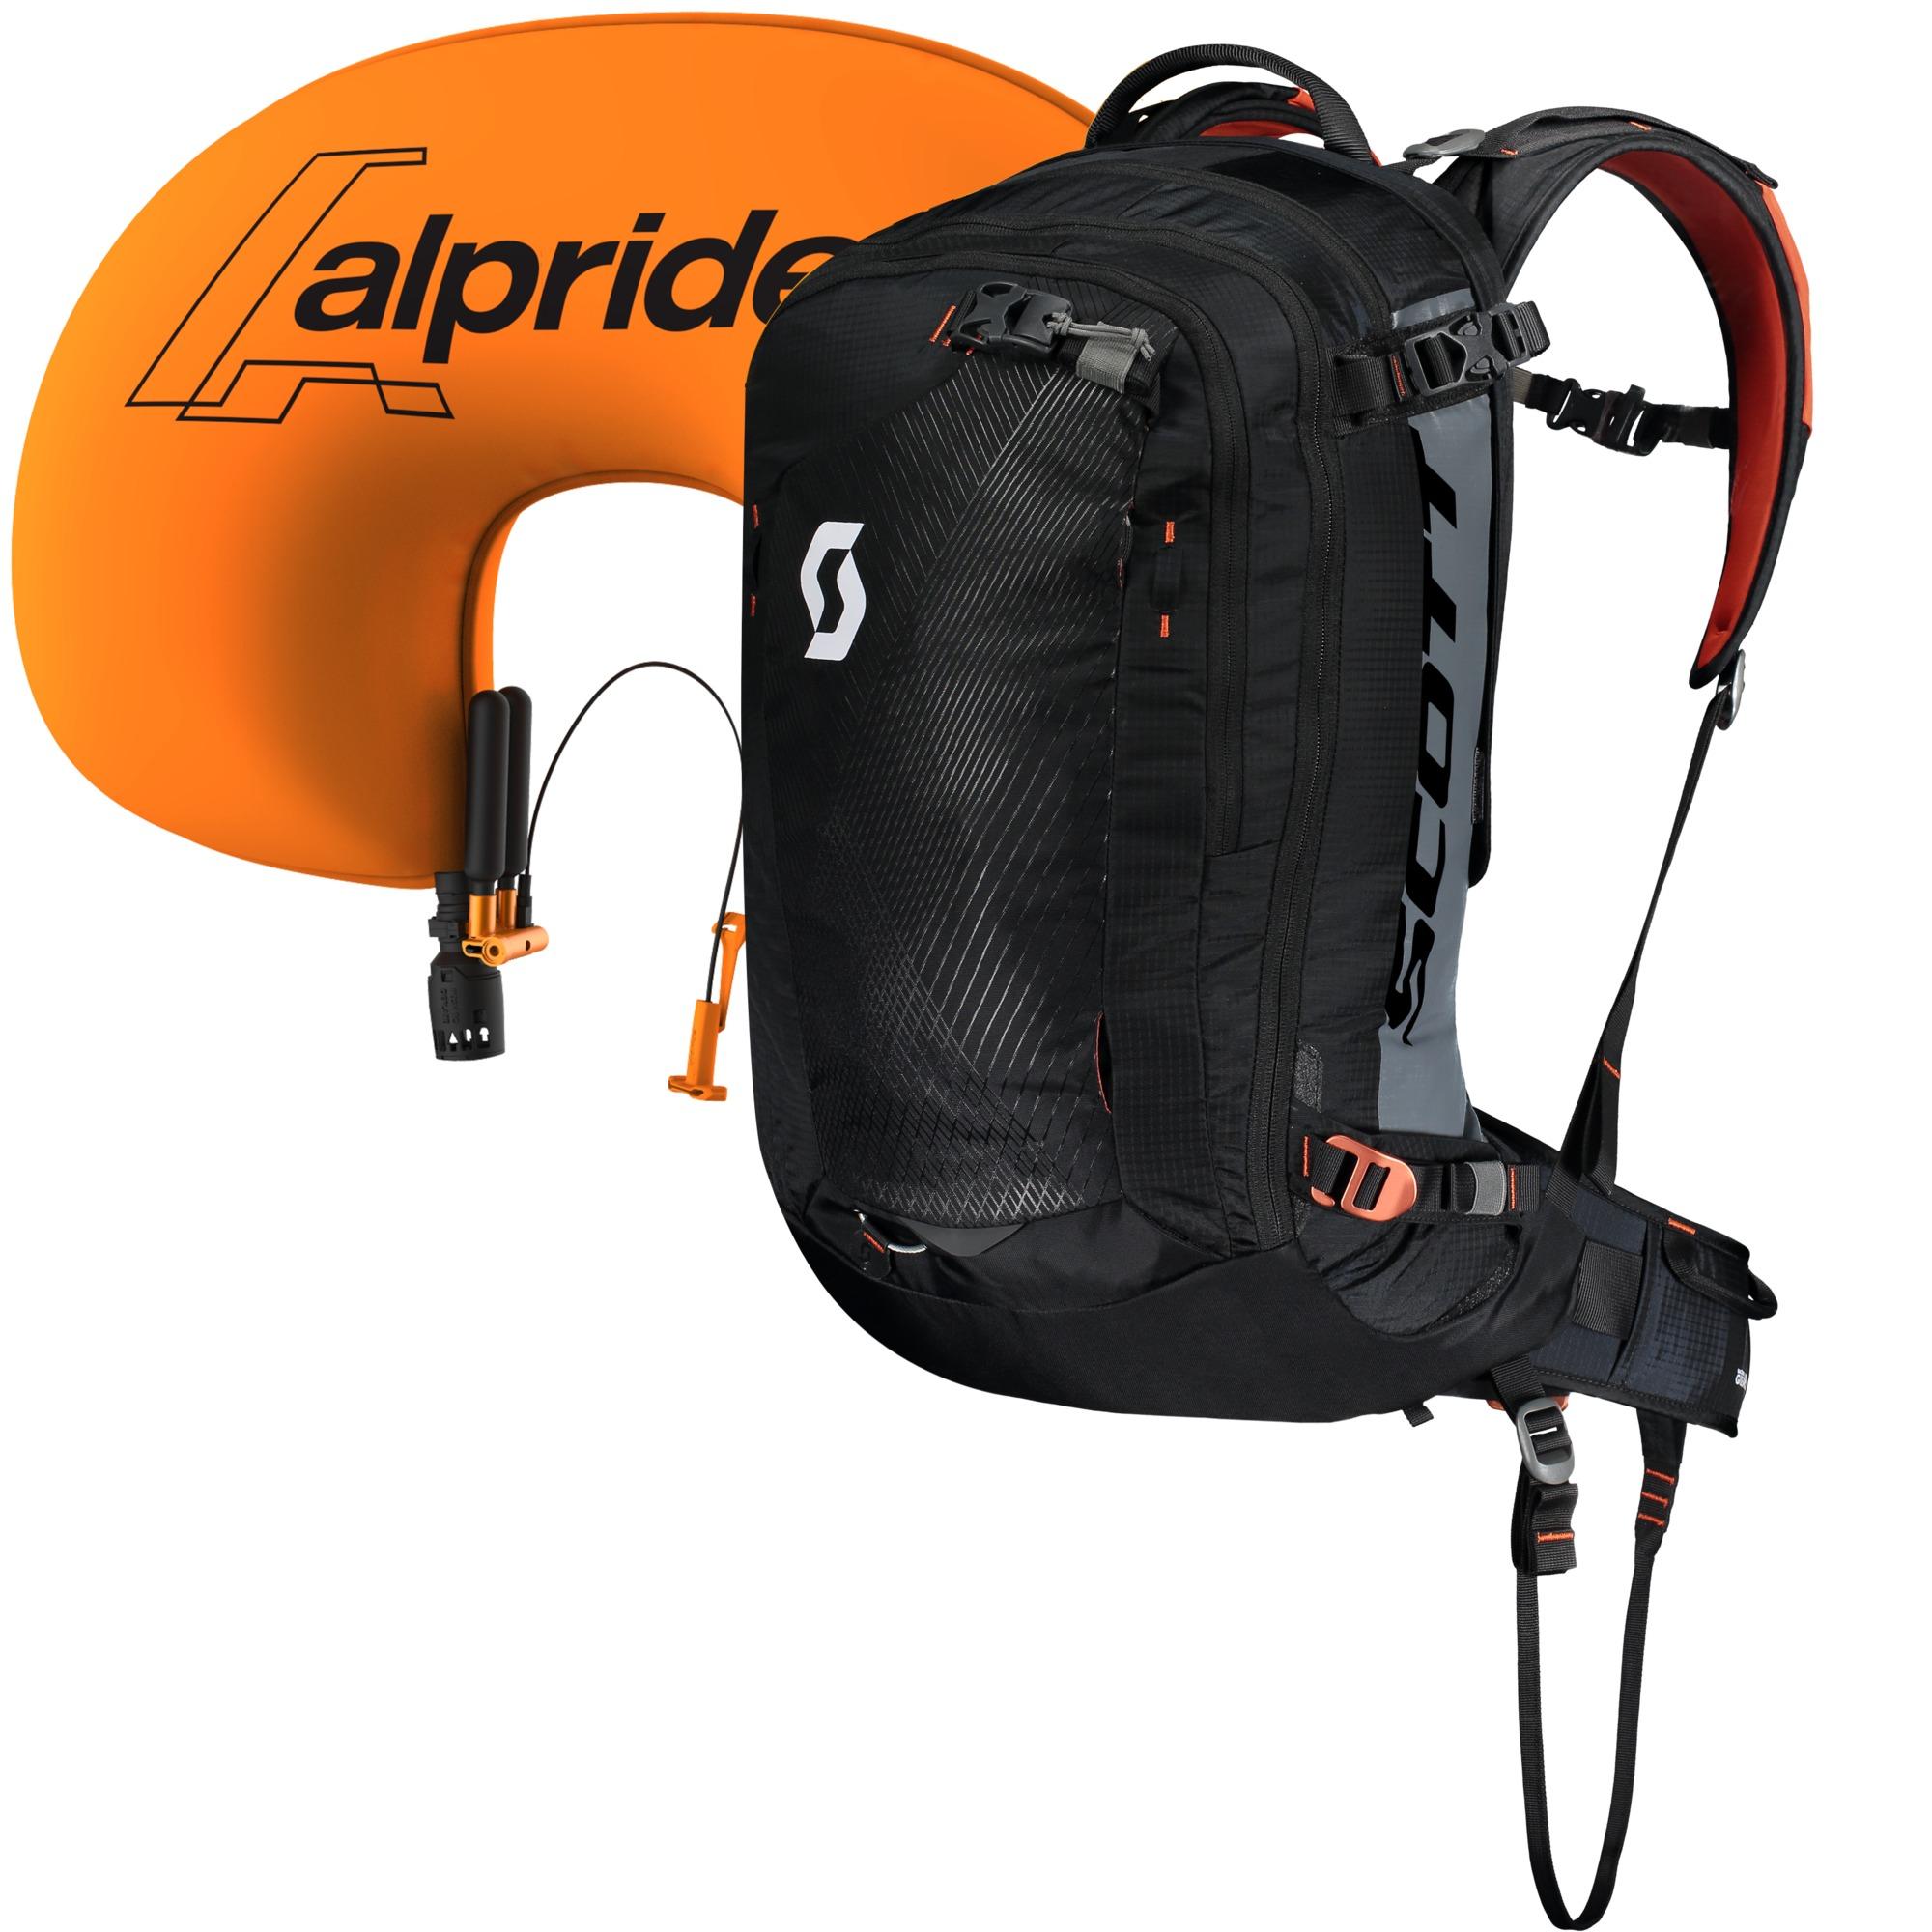 SCOTT GUIDE AP 30 Skirucksack Lawinenrucksack mit Airbag